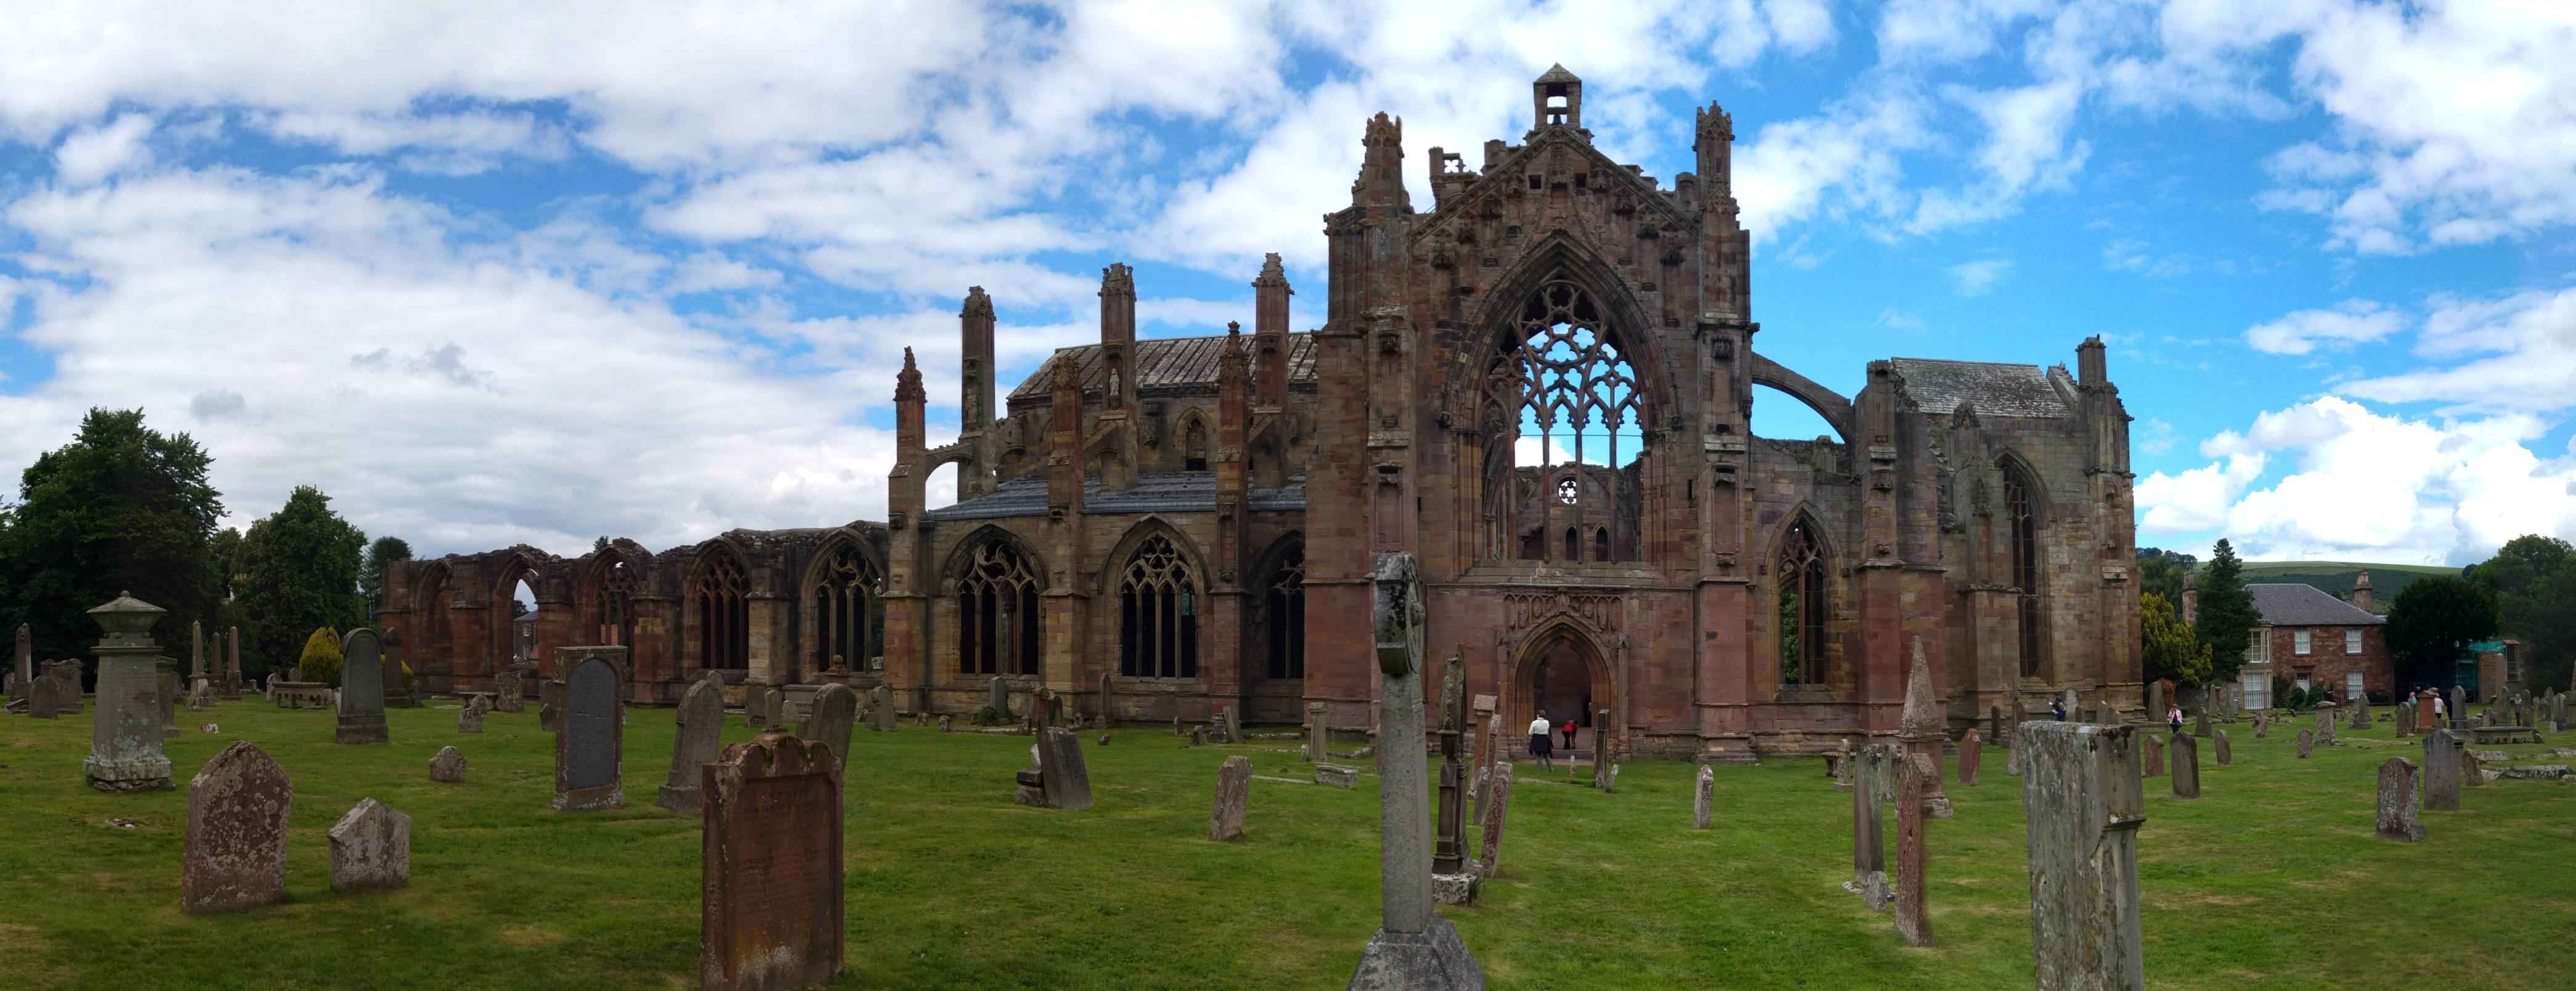 Die berühmte Melrose Abbey.